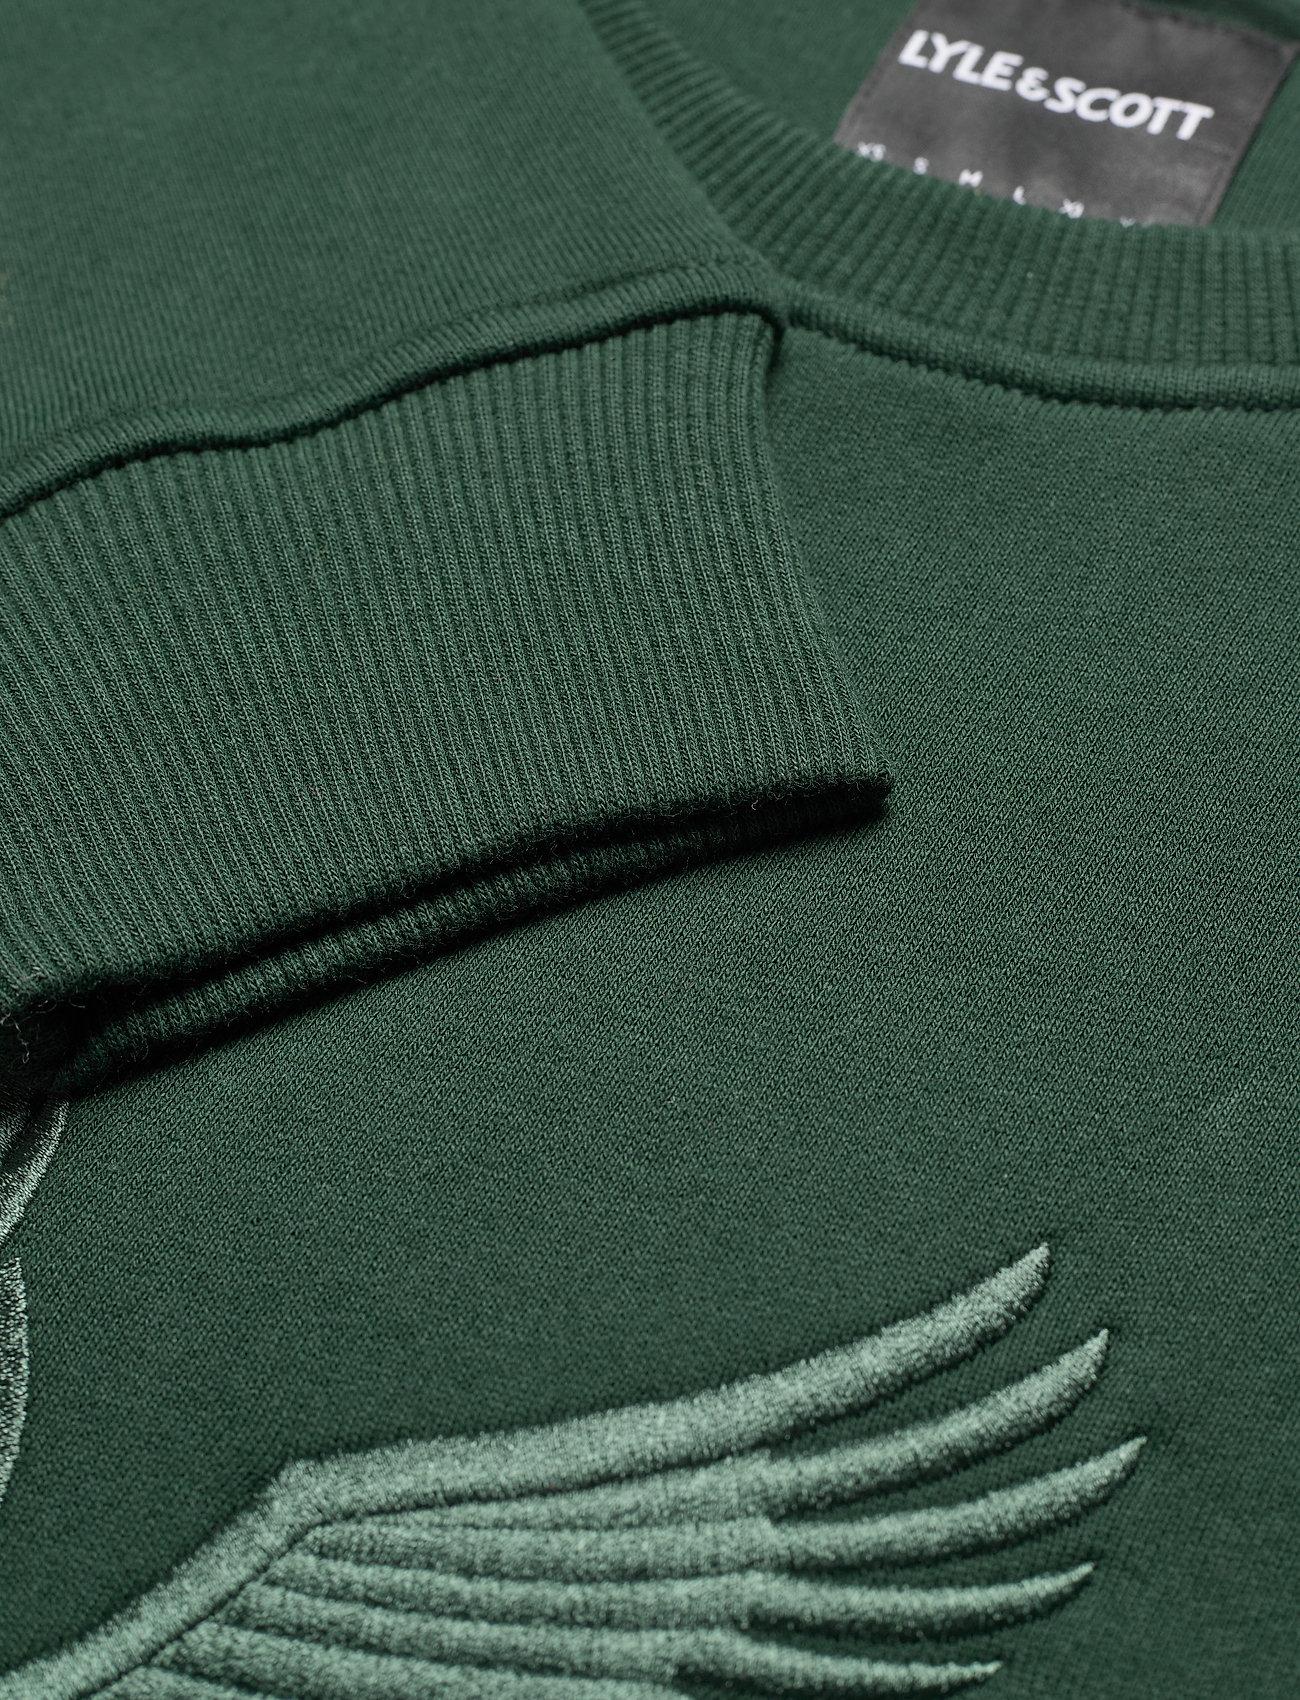 Lyle & Scott Embroidered Eagle Sweatshirt - Sweatshirts JADE GREEN - Menn Klær